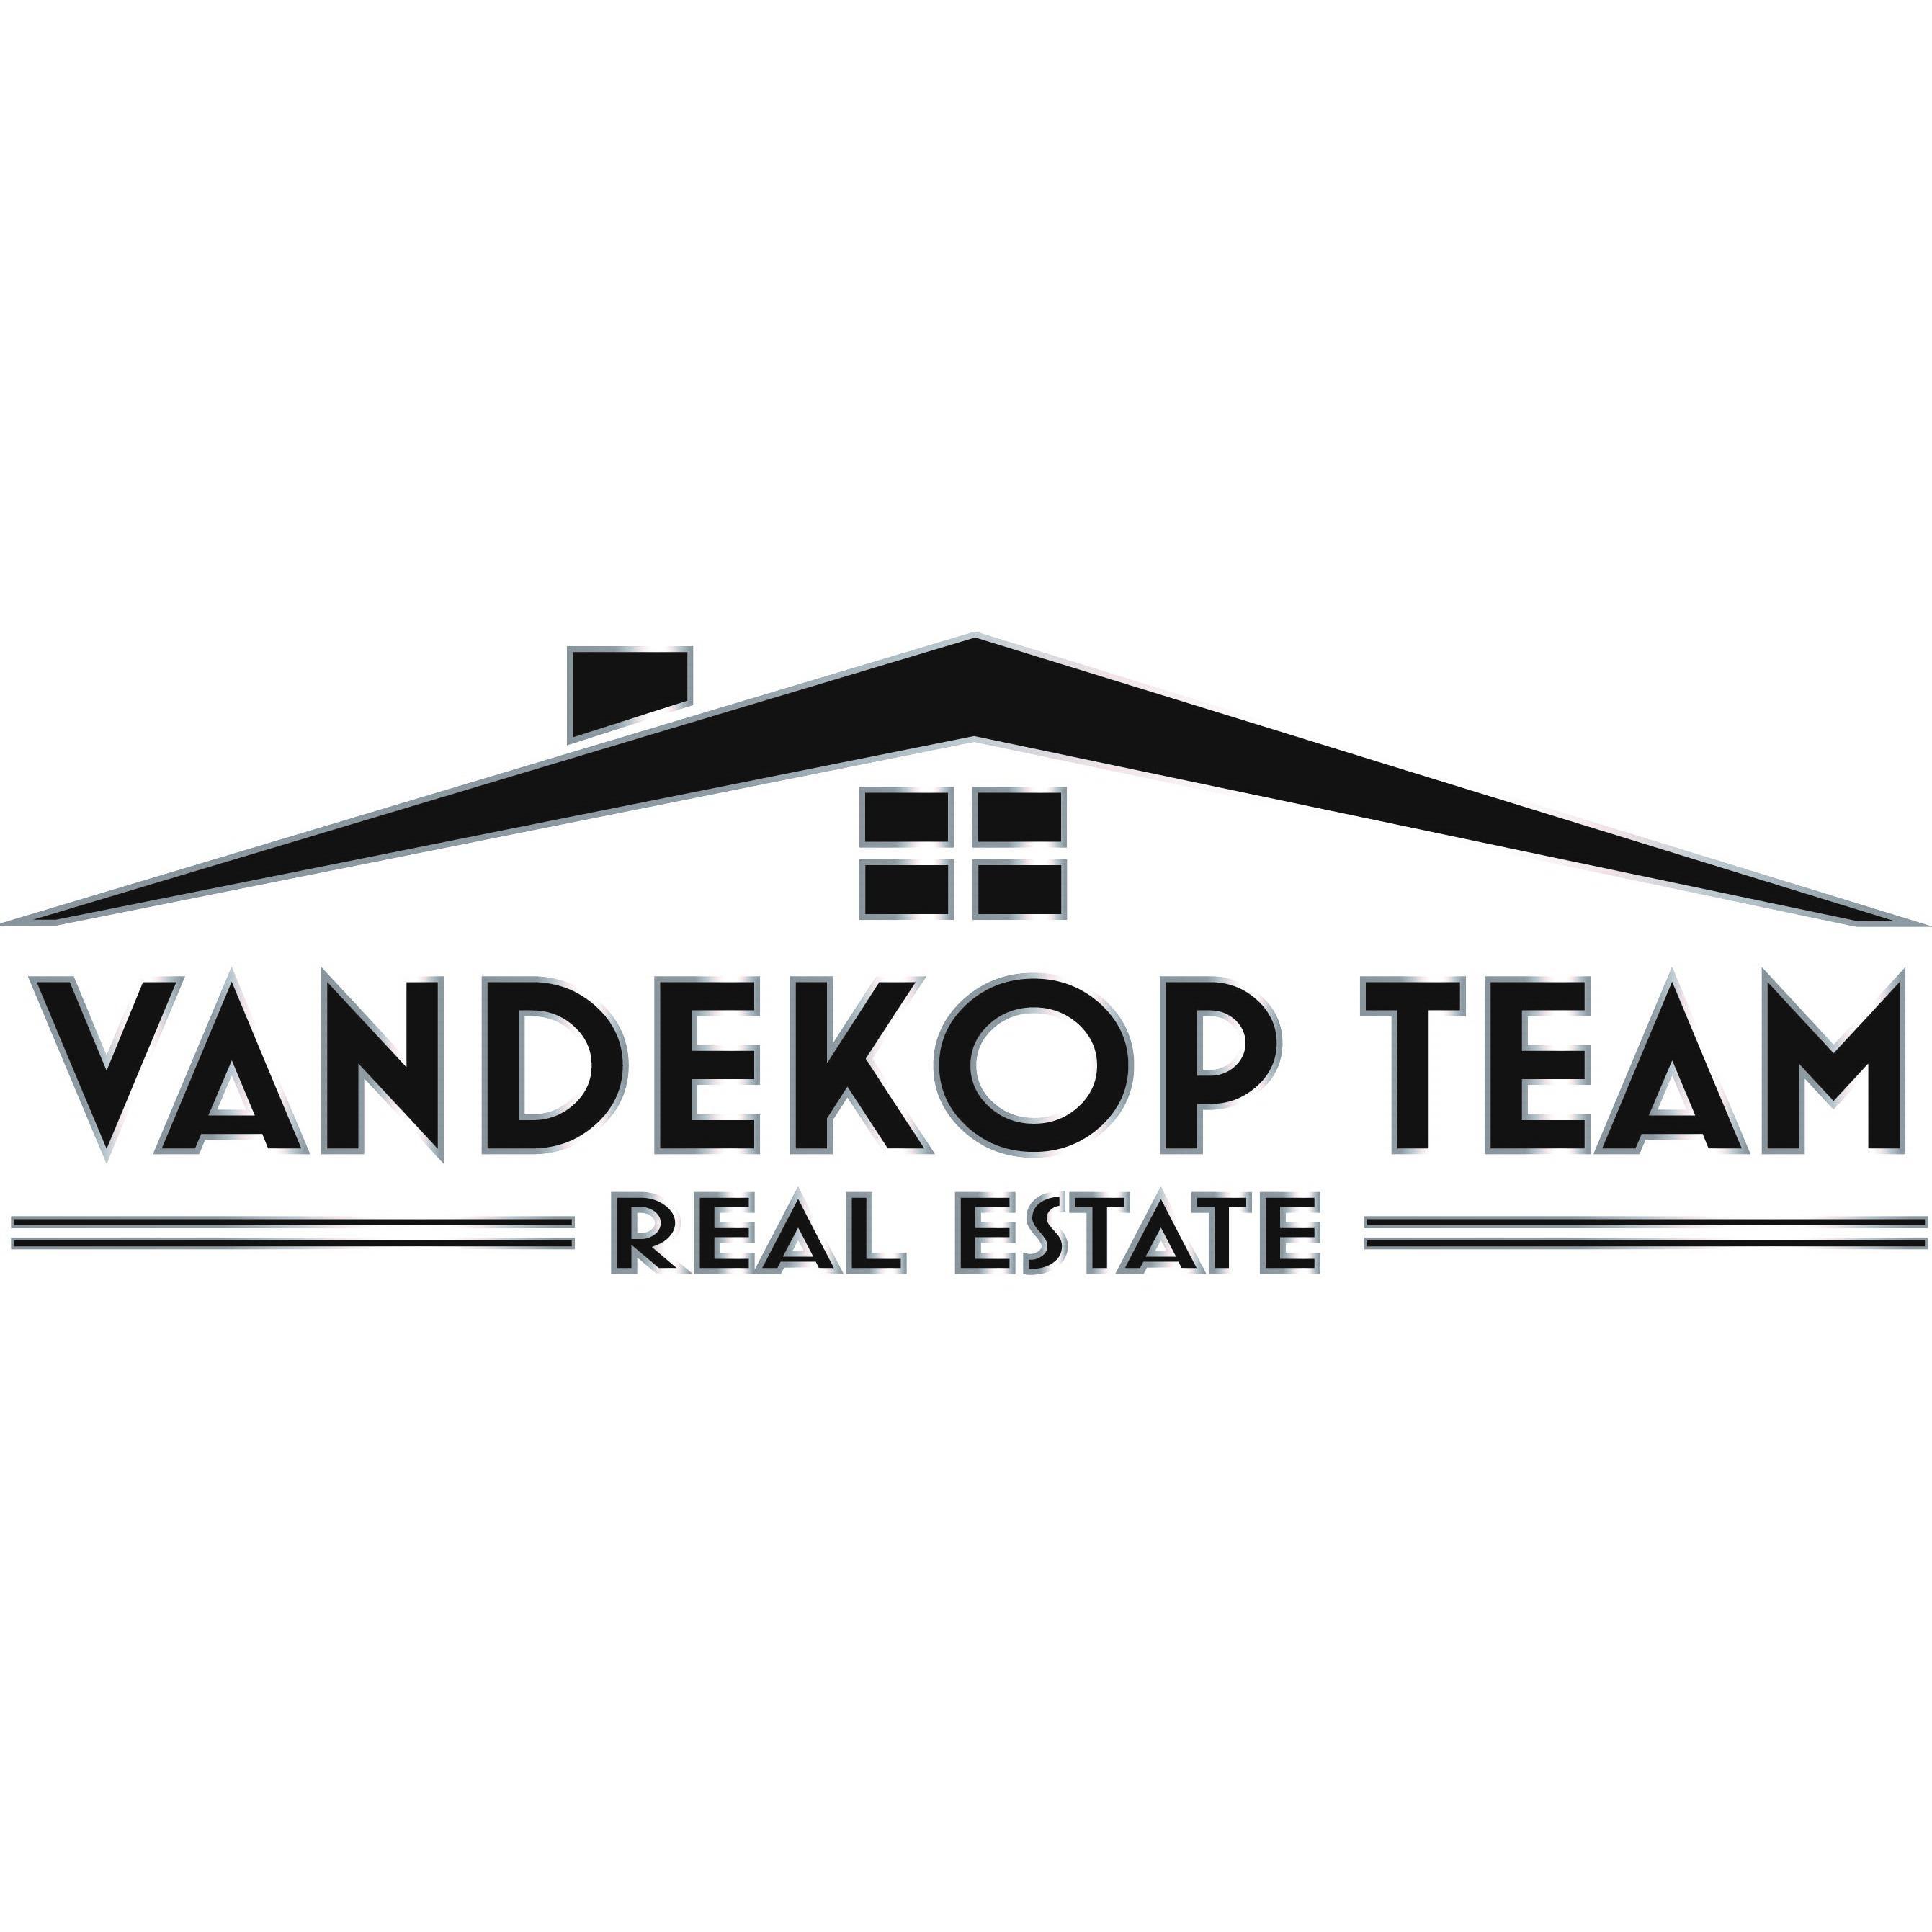 The VanDeKop Real Estate Team